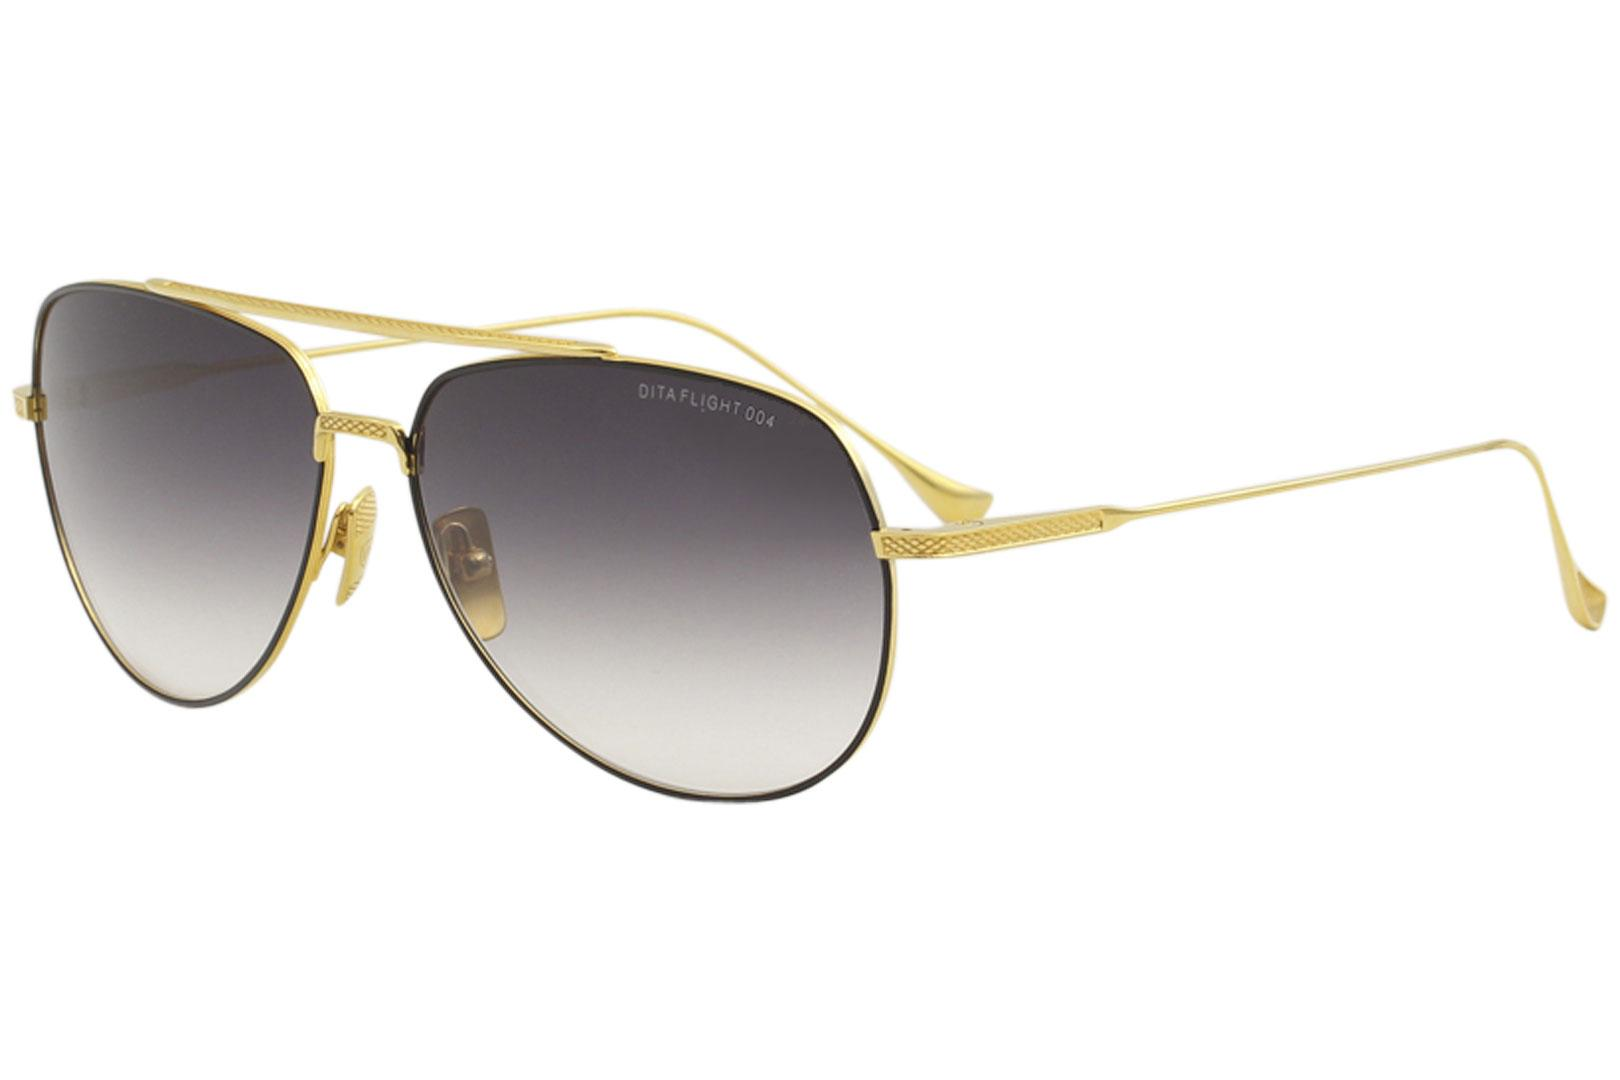 1e74c6546c2 Dita Men s Flight-004 7804 18K Gold Fashion Pilot Titanium Sunglasses